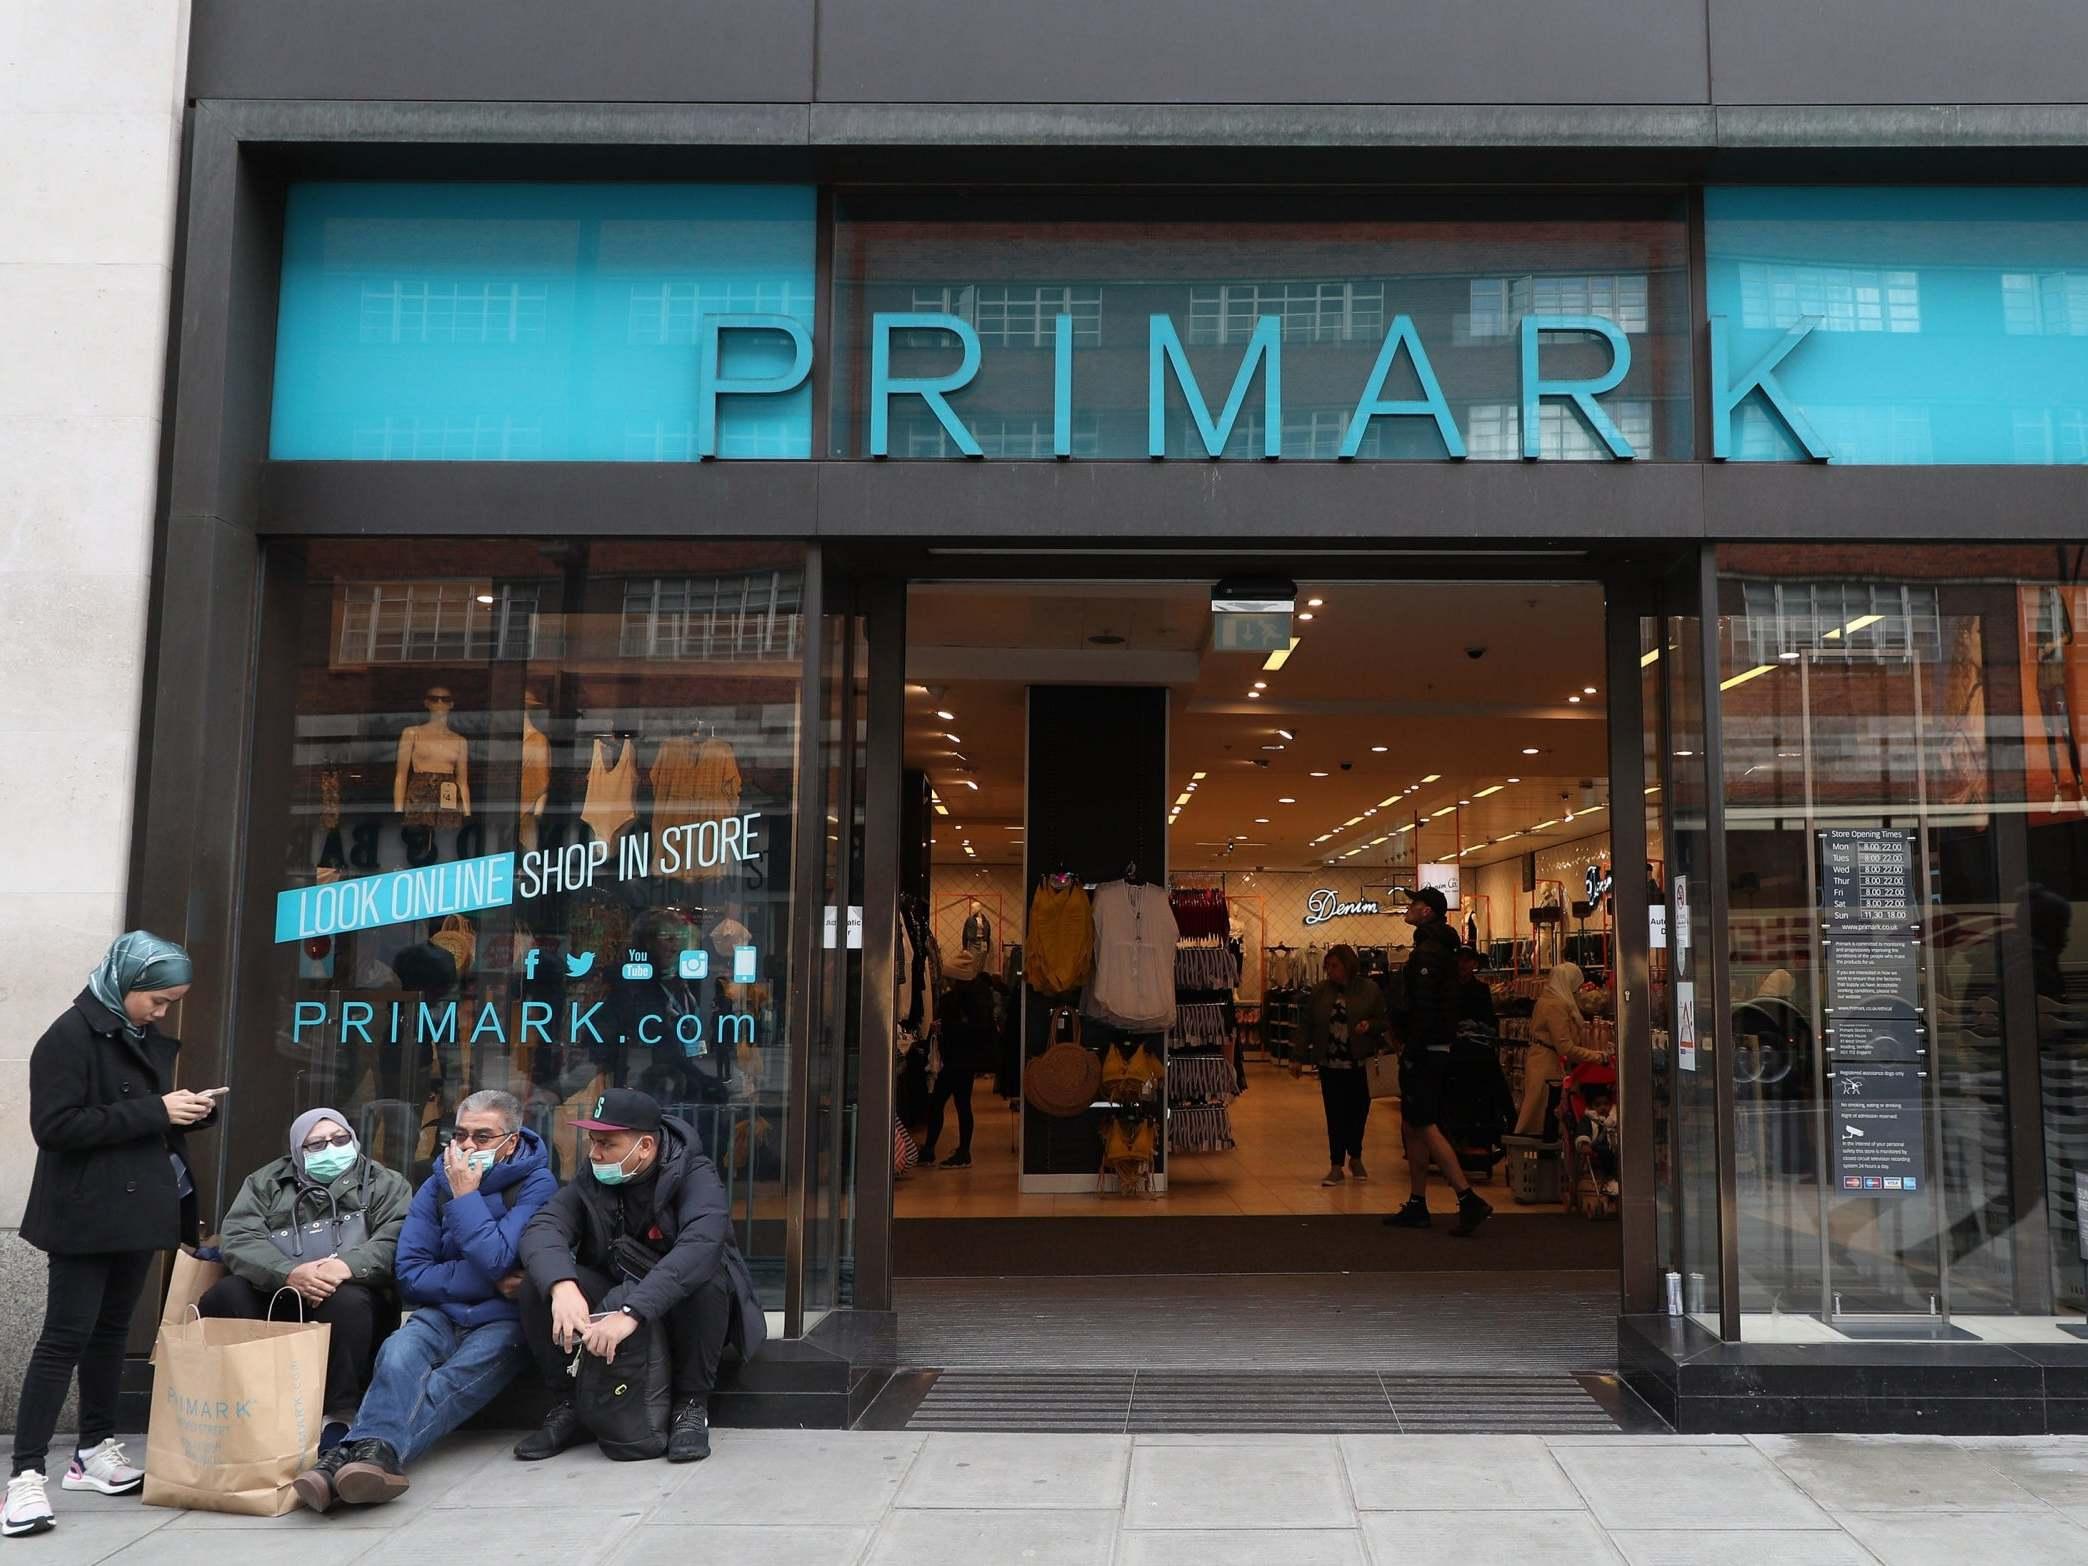 Coronavirus: Primark joins retail giants closing high street stores